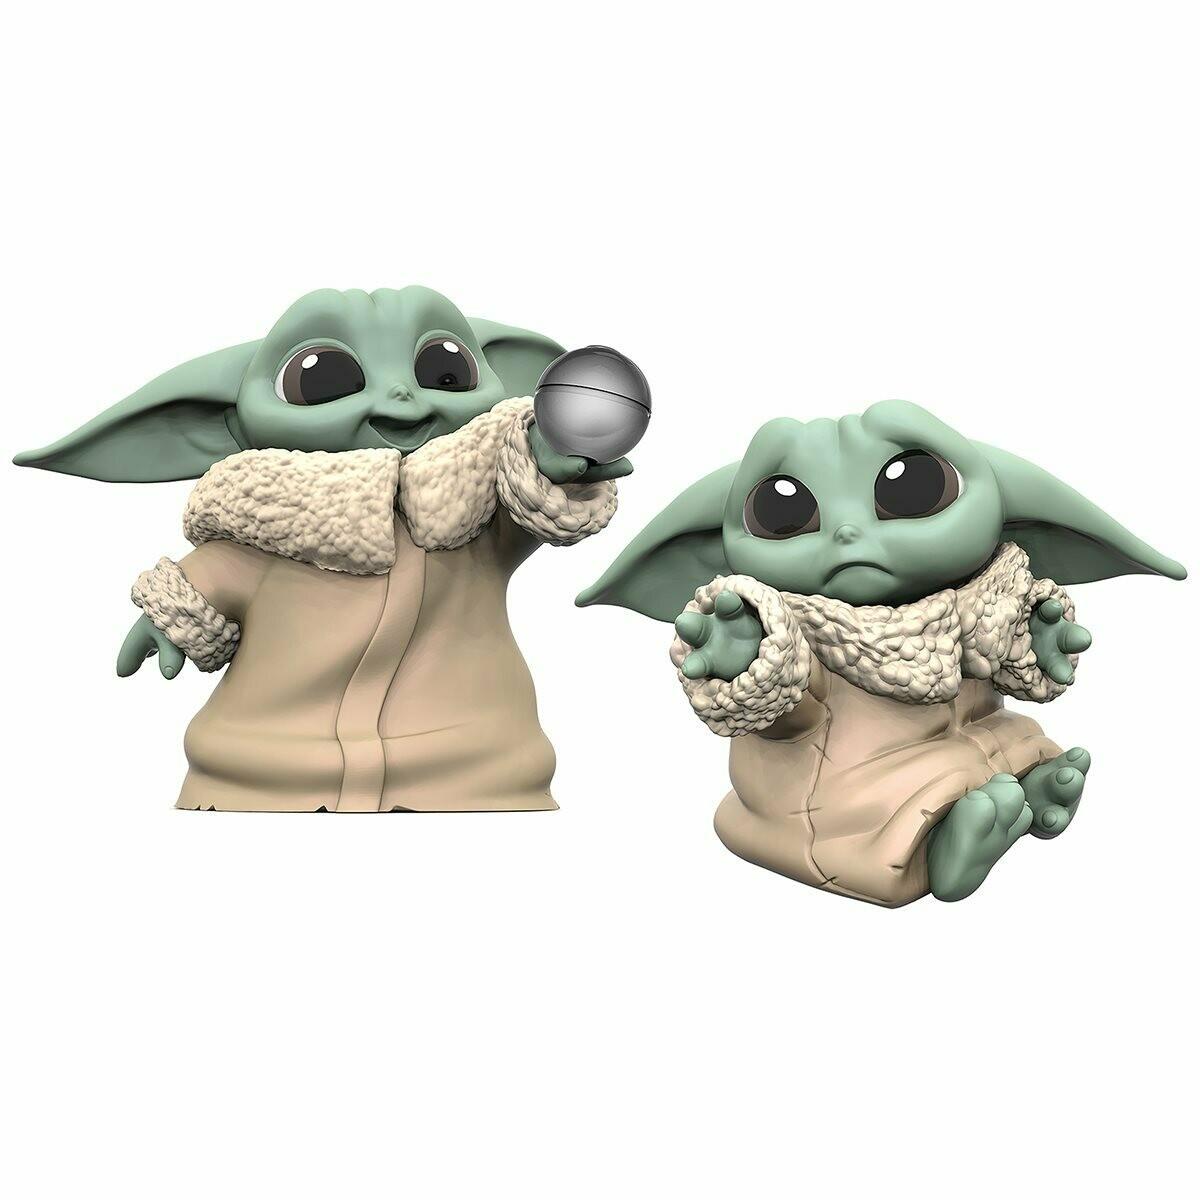 Hasbro Star Wars The Mandalorian Baby Bounties Hold Me and Ball Mini-Figures